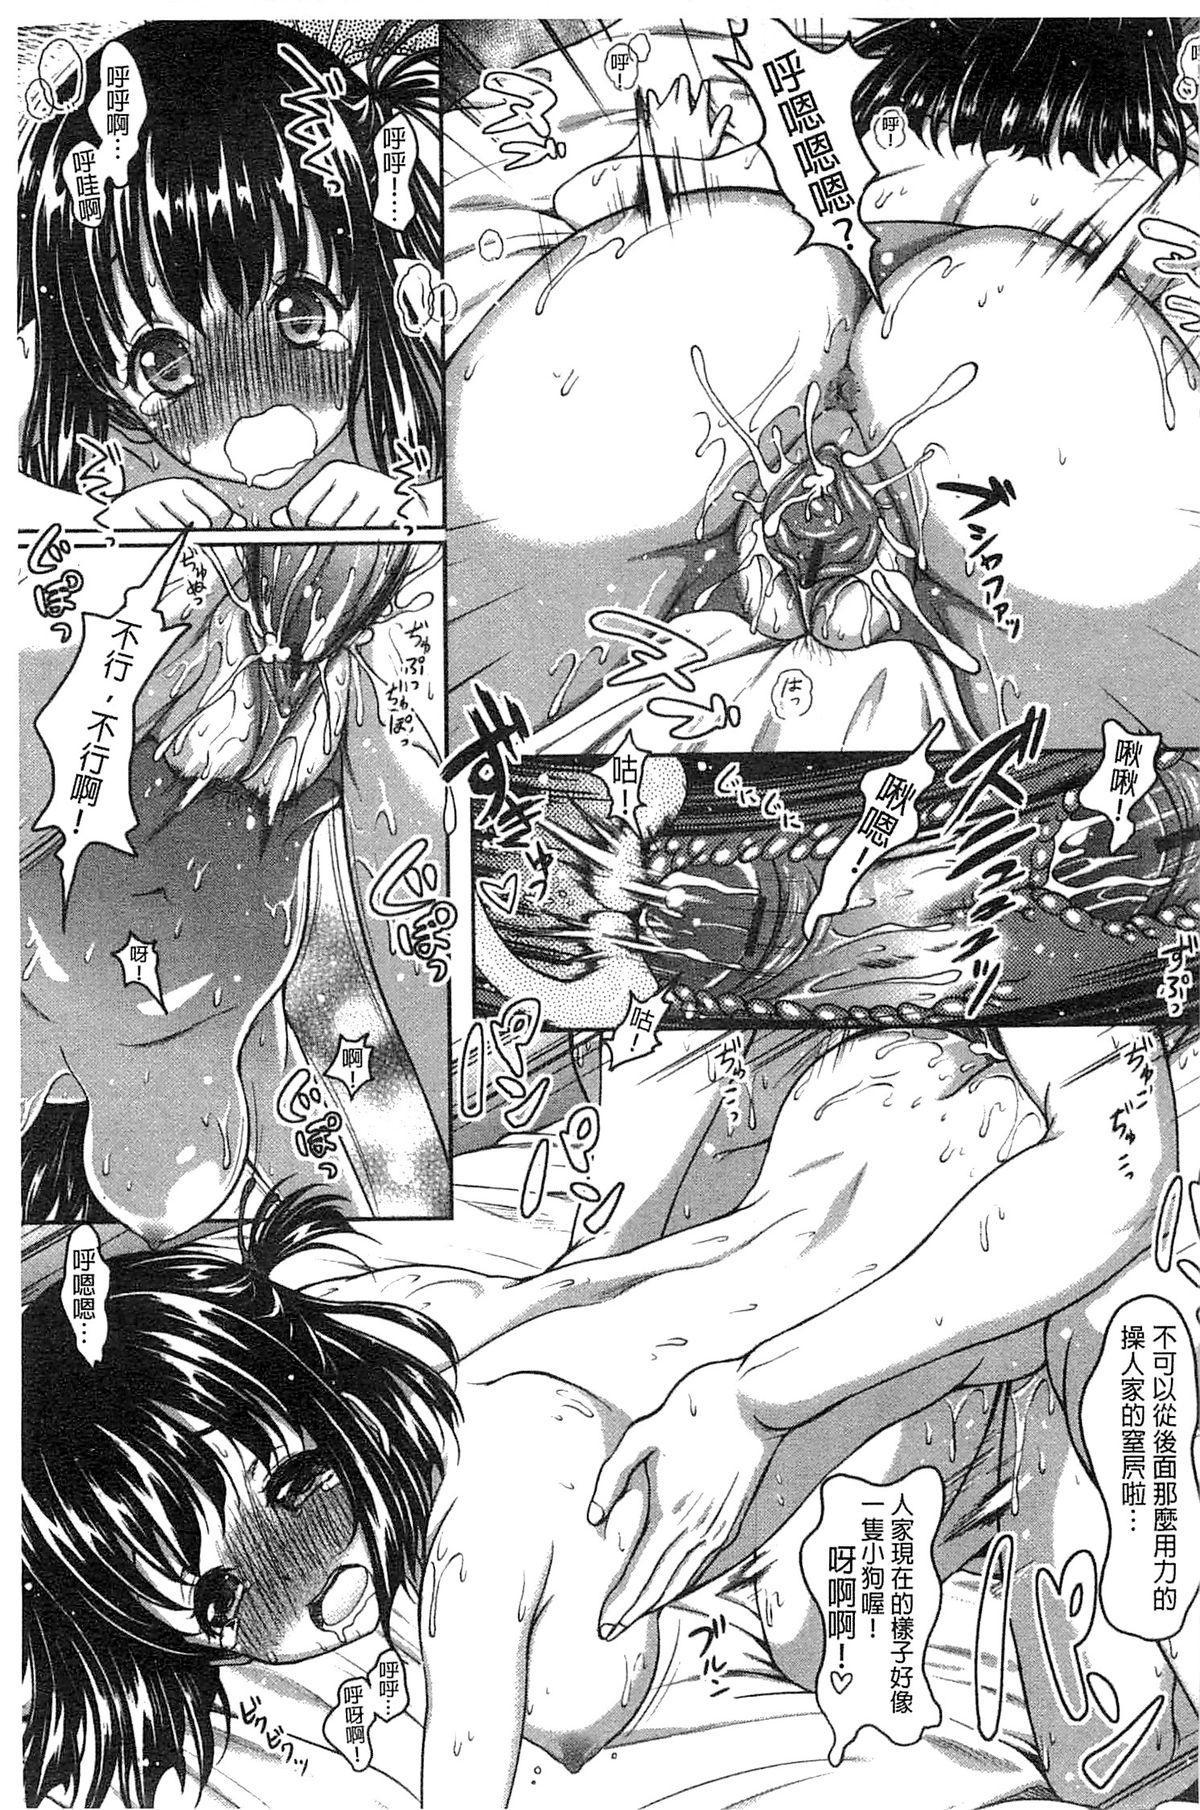 Hajimete nan da kara 95